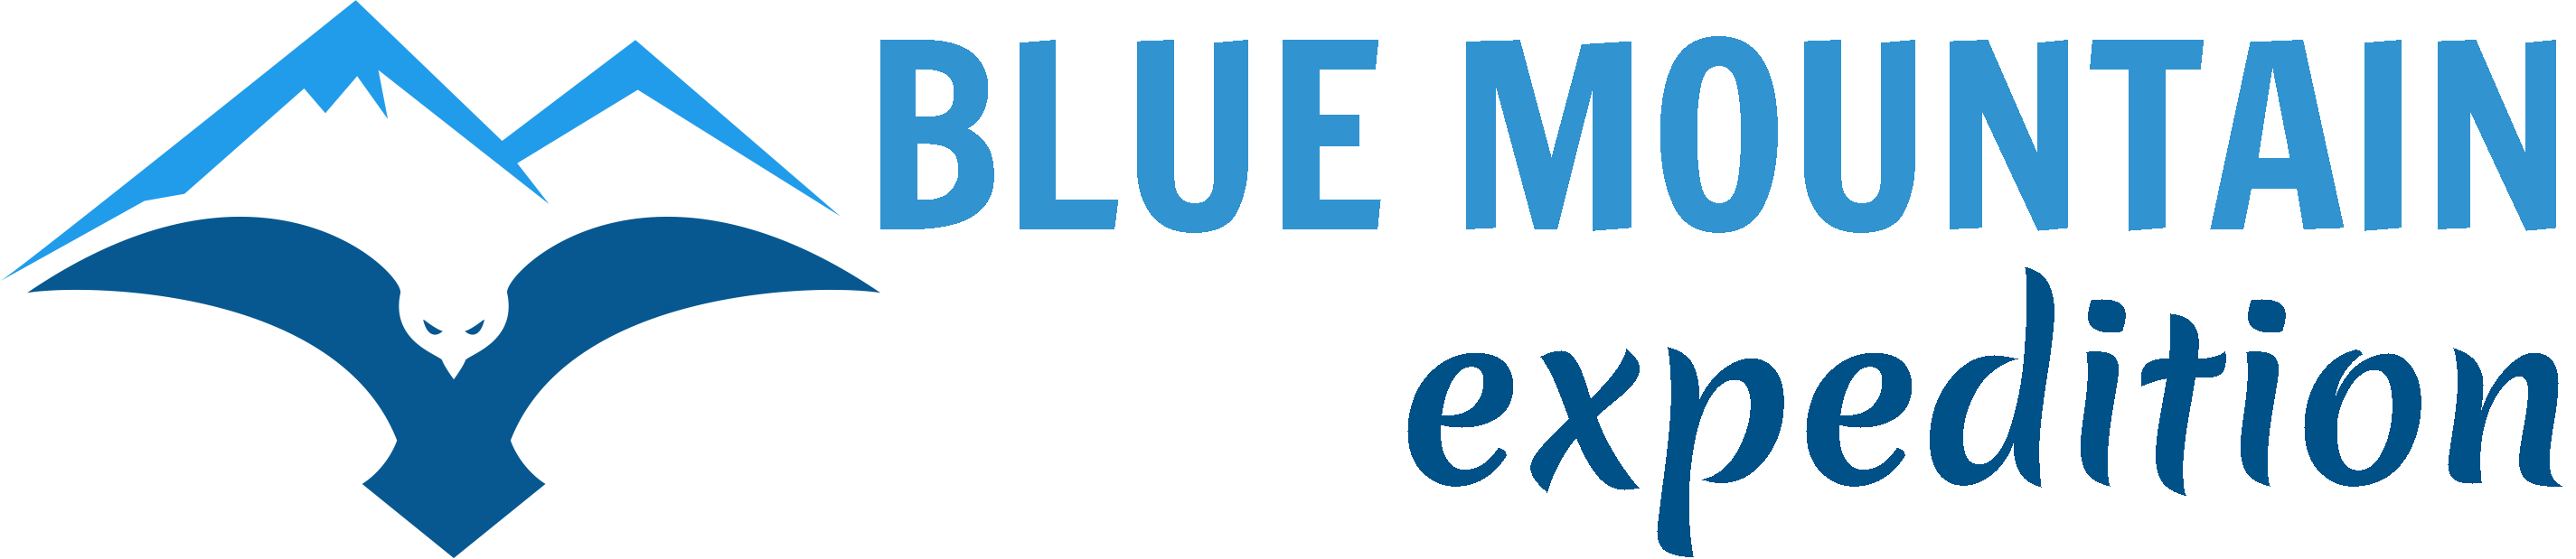 bluemountainexpedition